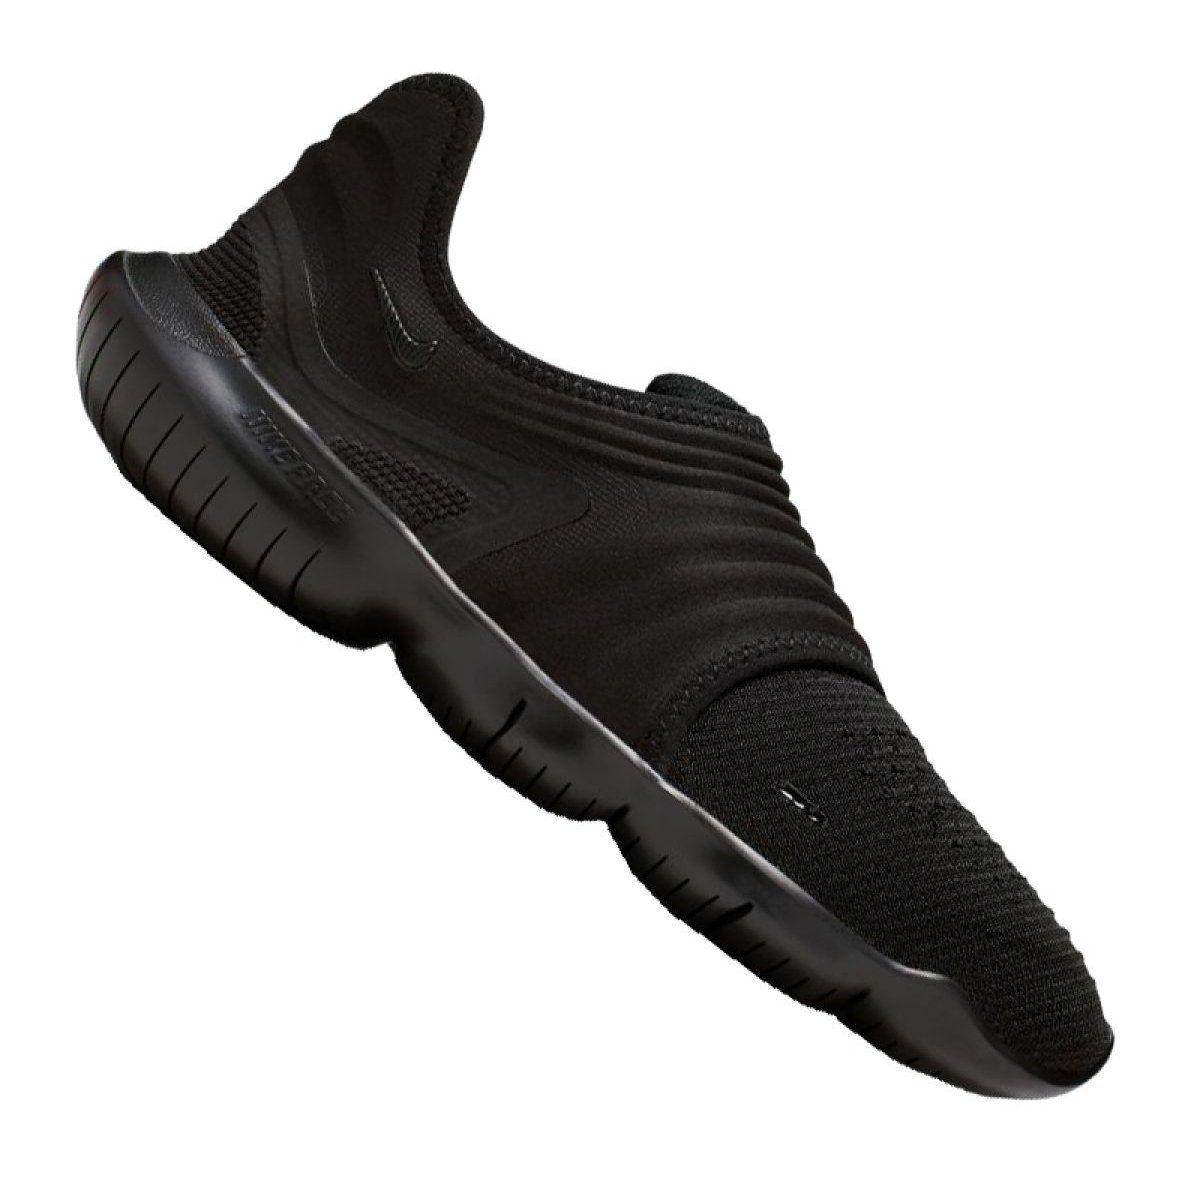 Running Shoes Nike Free Rn Flyknit 3 0 M Aq5707 006 Black Running Shoes Nike Free Nike Shoes Running Shoes Nike